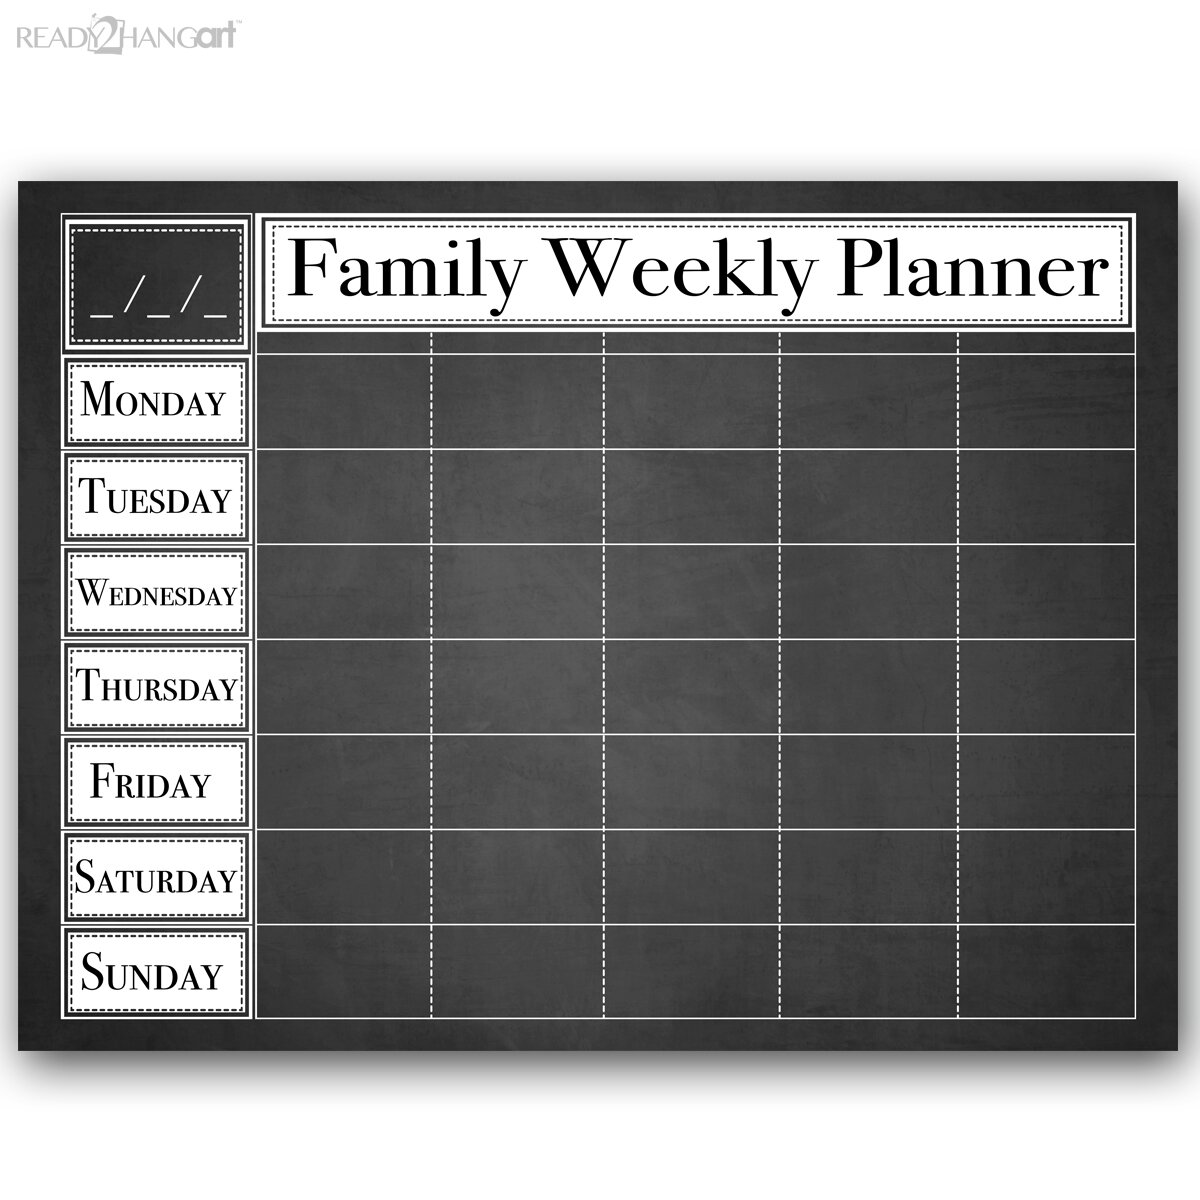 Weekly Calendar Board : Ready hangart dry erase family weekly calendar memo board